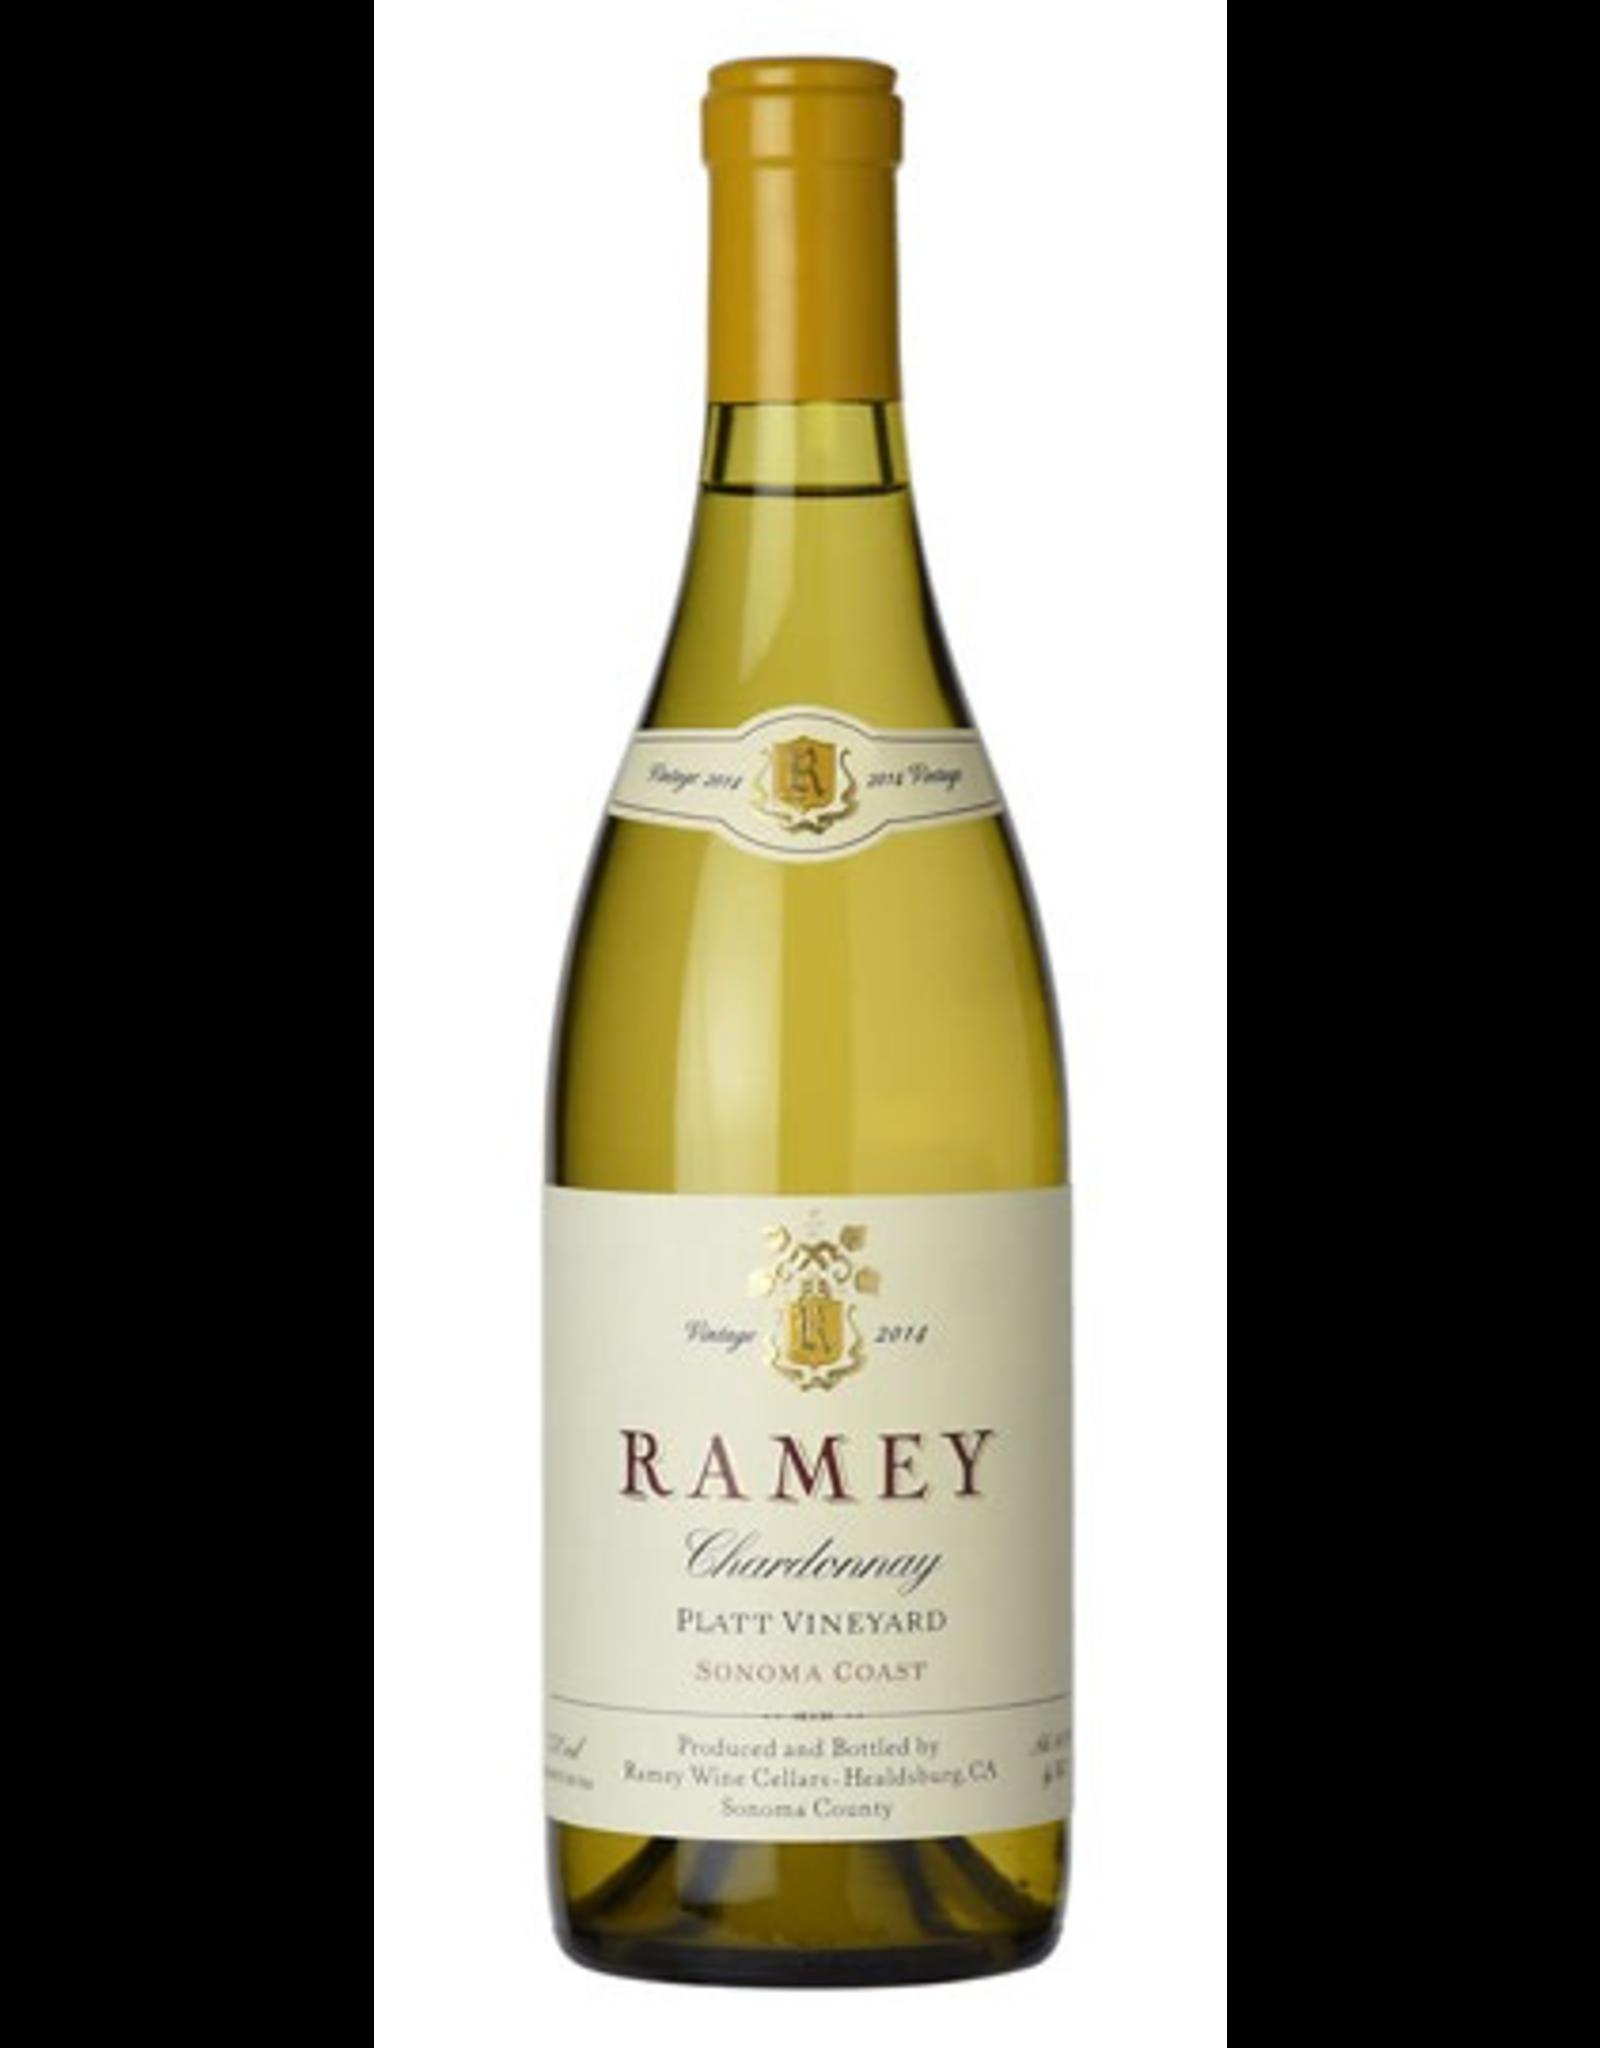 White Wine 2014, Ramey, Chardonnay, Pratt Vineyard, Sonoma Coast, California, 14.5% Alc, CT92.5 RP95